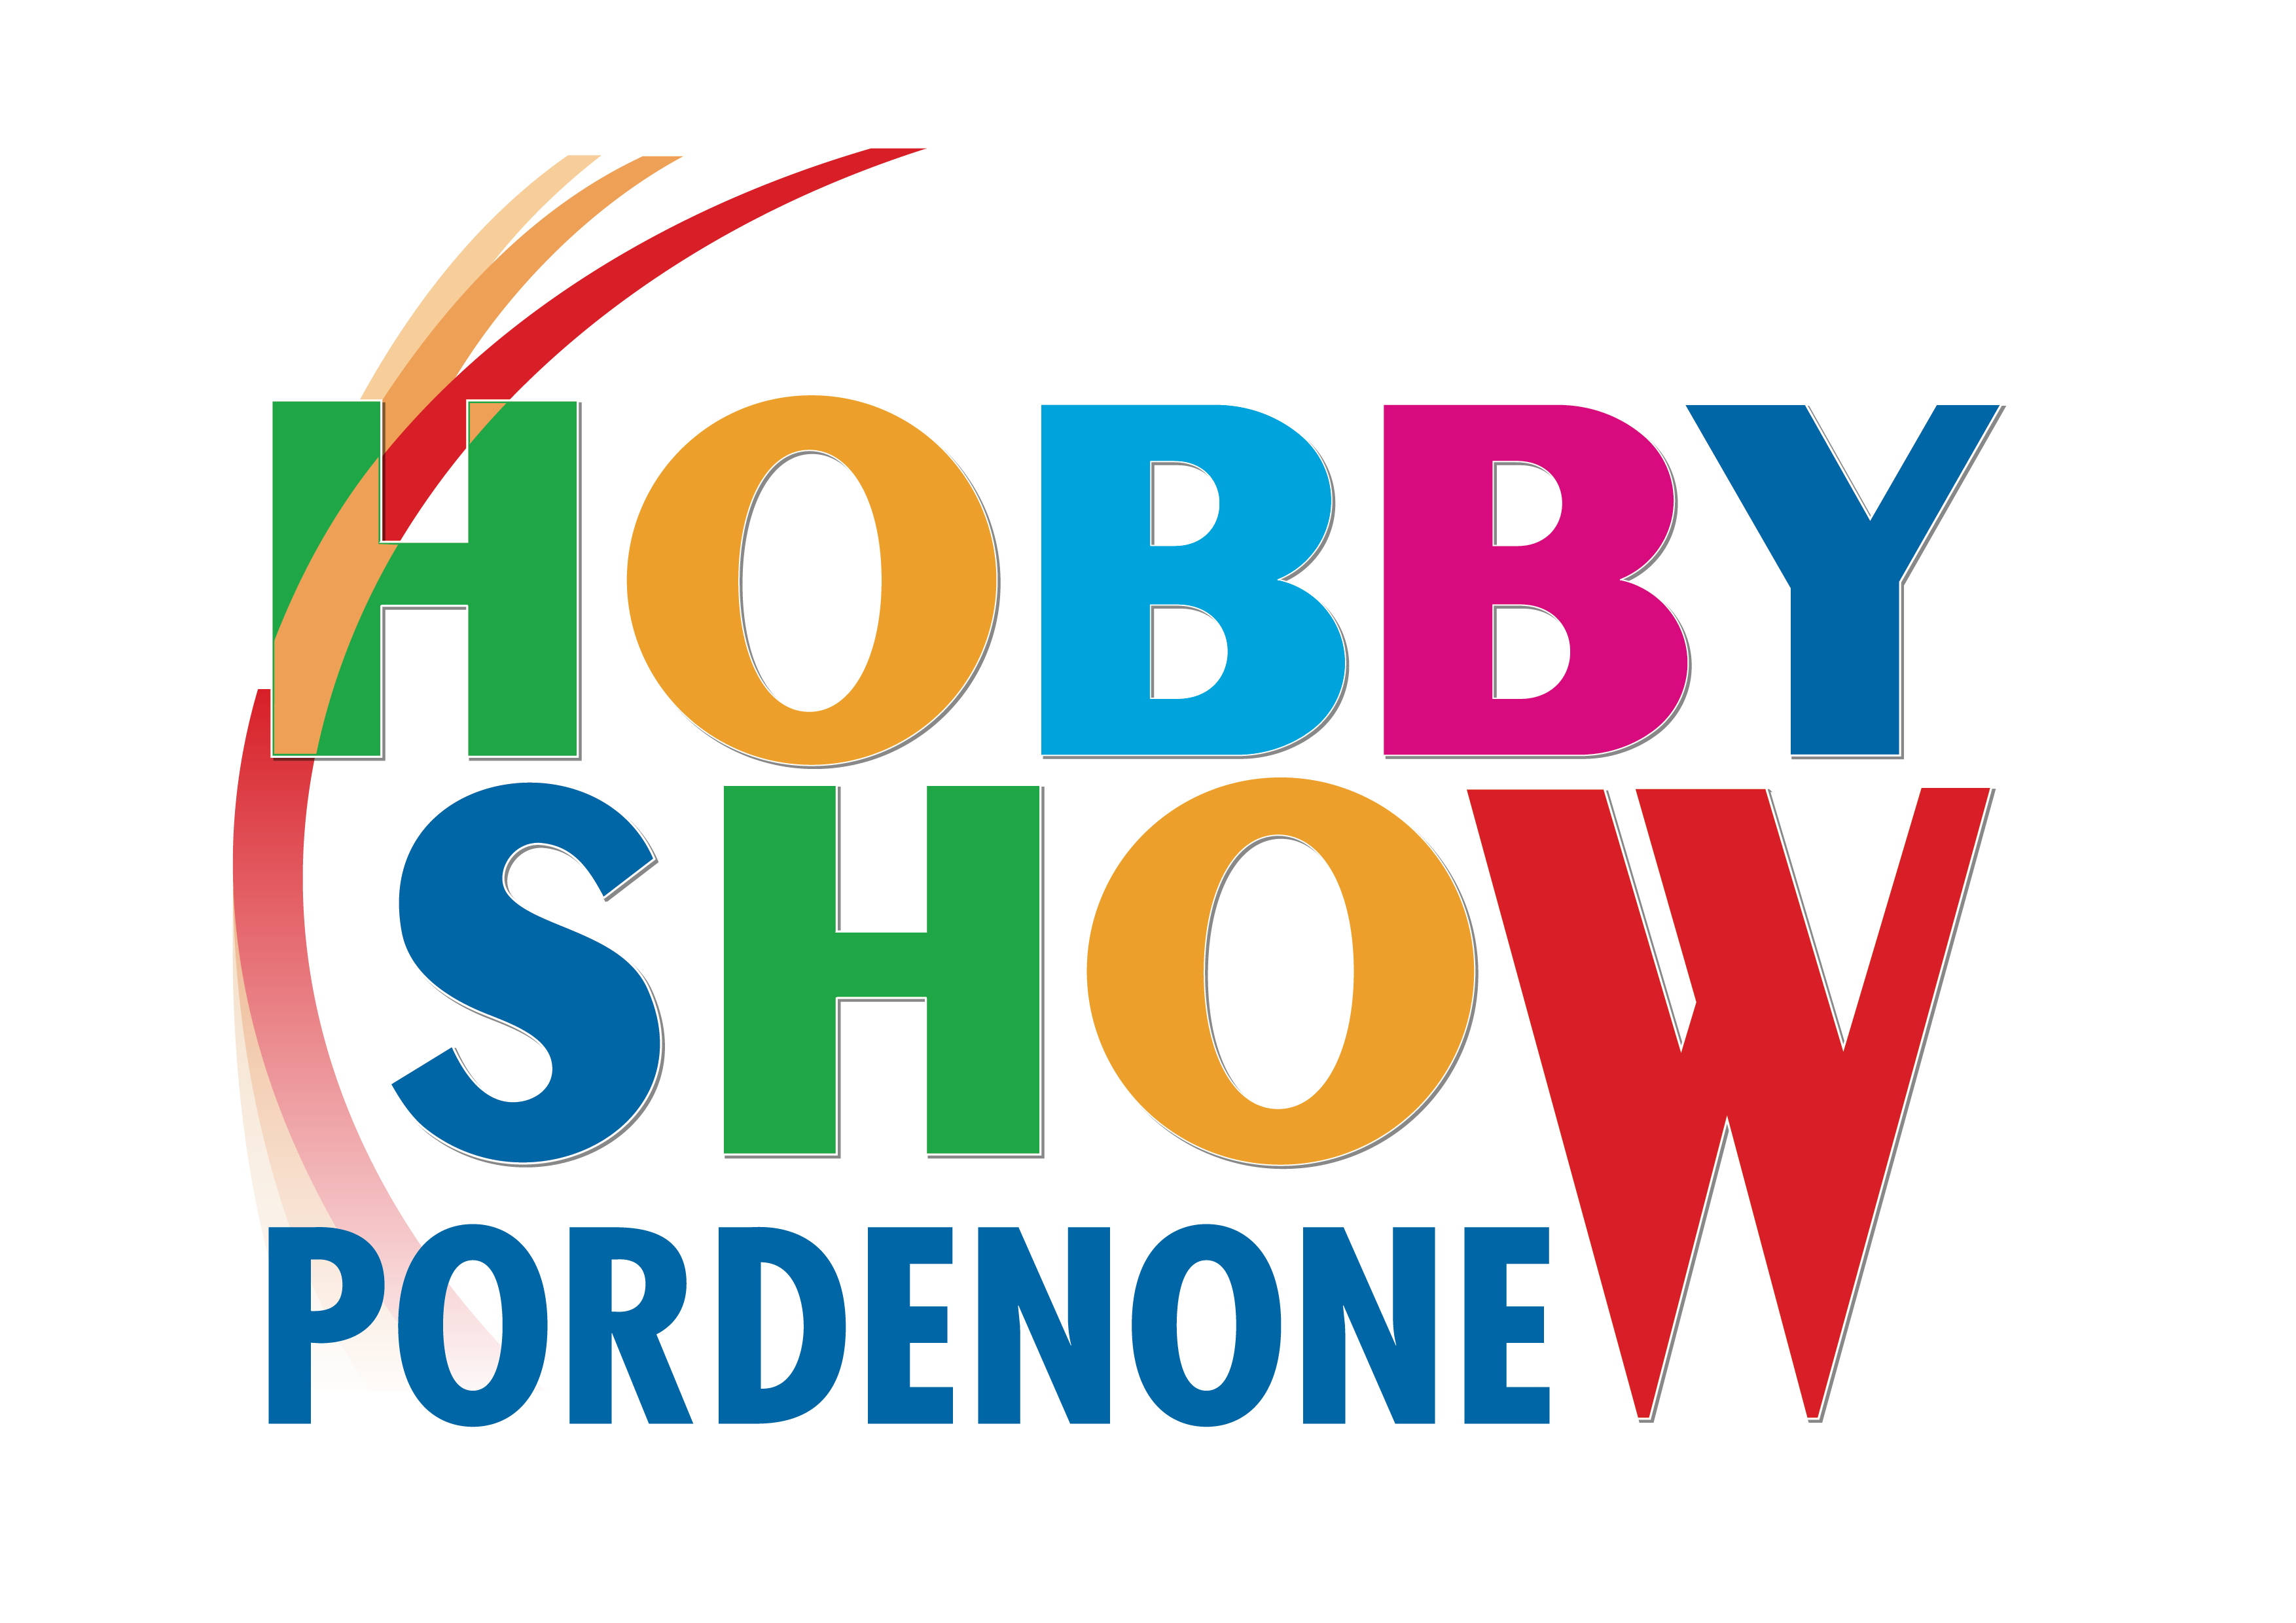 HOBBY SHOW-sajam kreativnosti -PORDENONE I SHOPPING U PALMANOVI